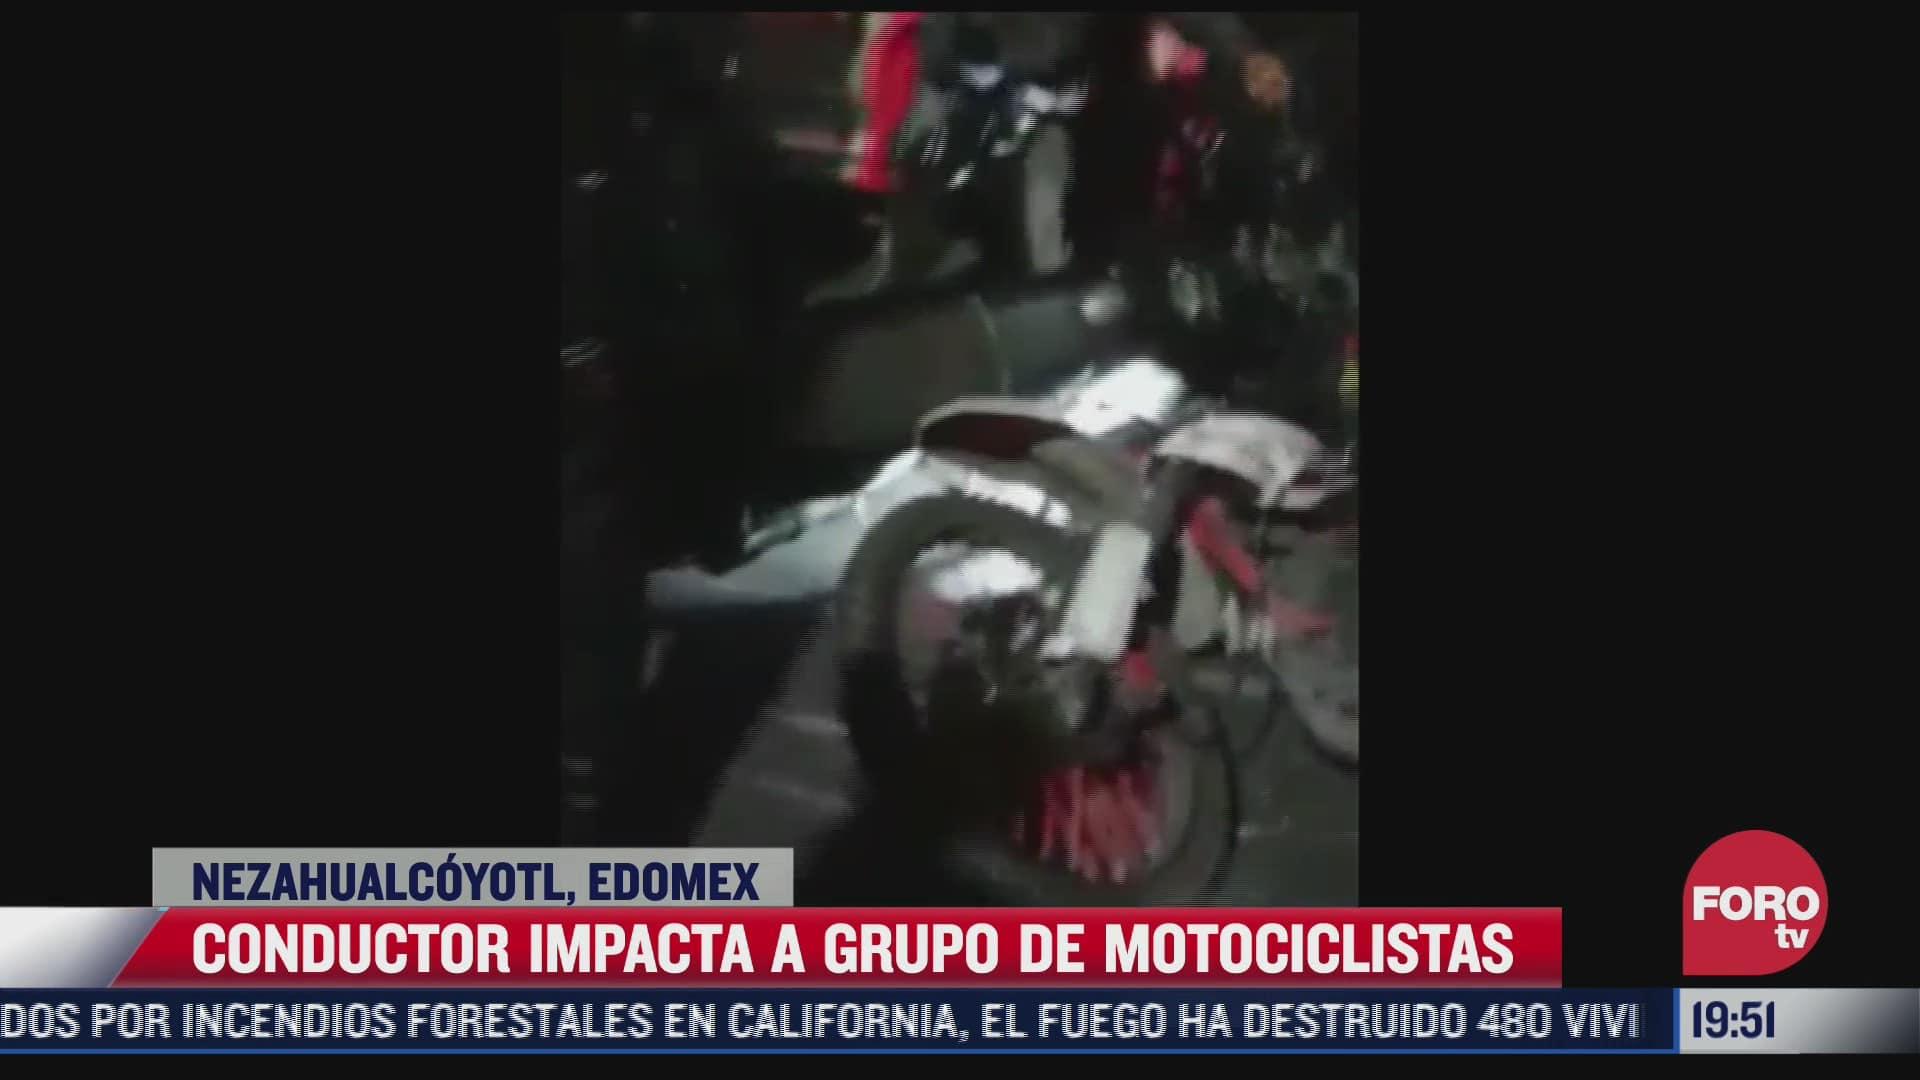 conductor impacta a motociclistas en neza